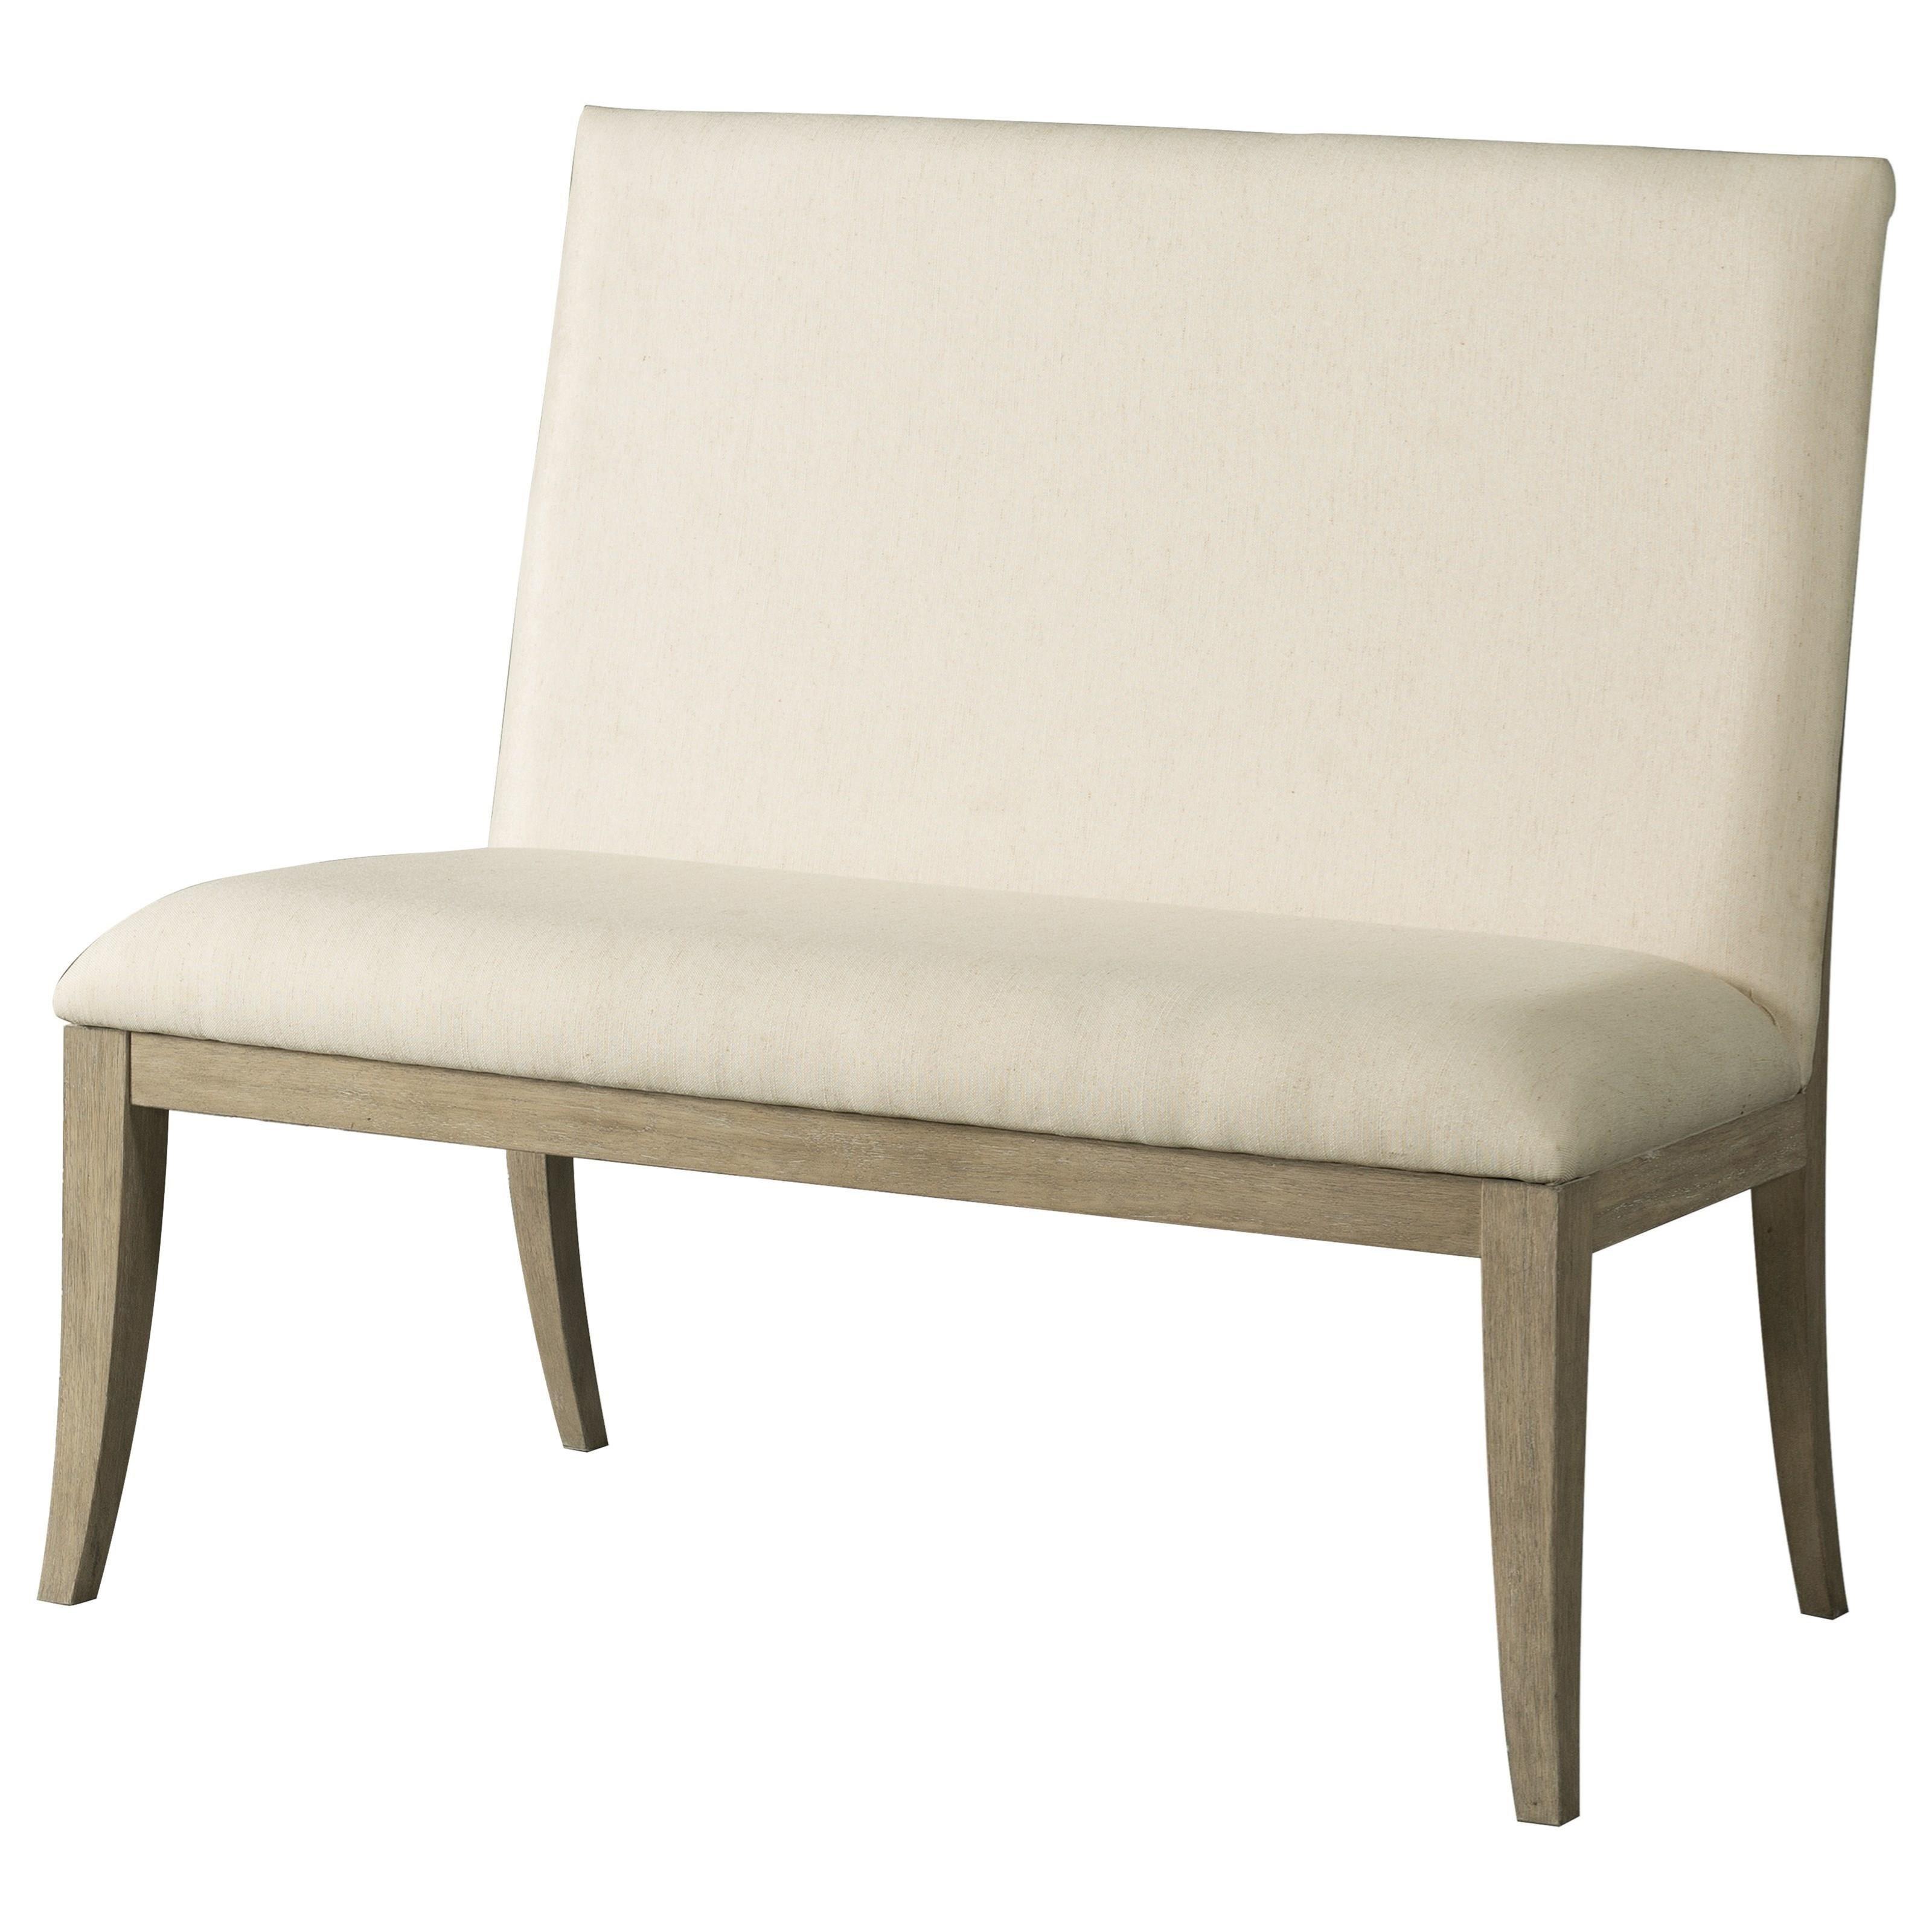 Riverside Furniture Sophie 50344 Contemporary Upholstered Dining